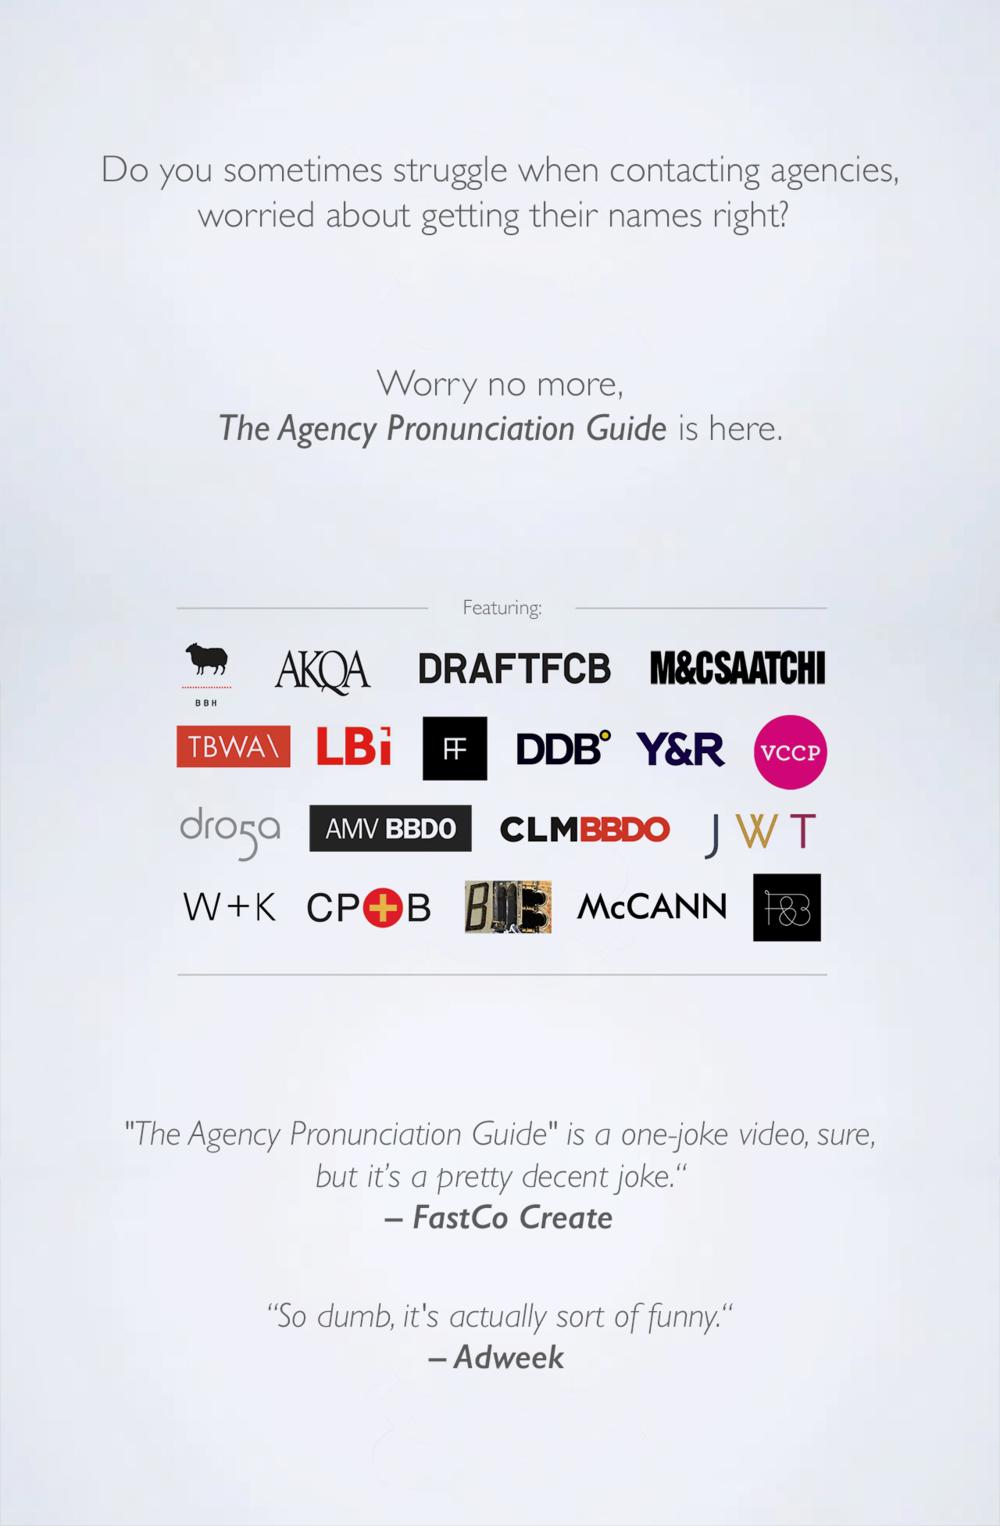 agencypronunciation.png